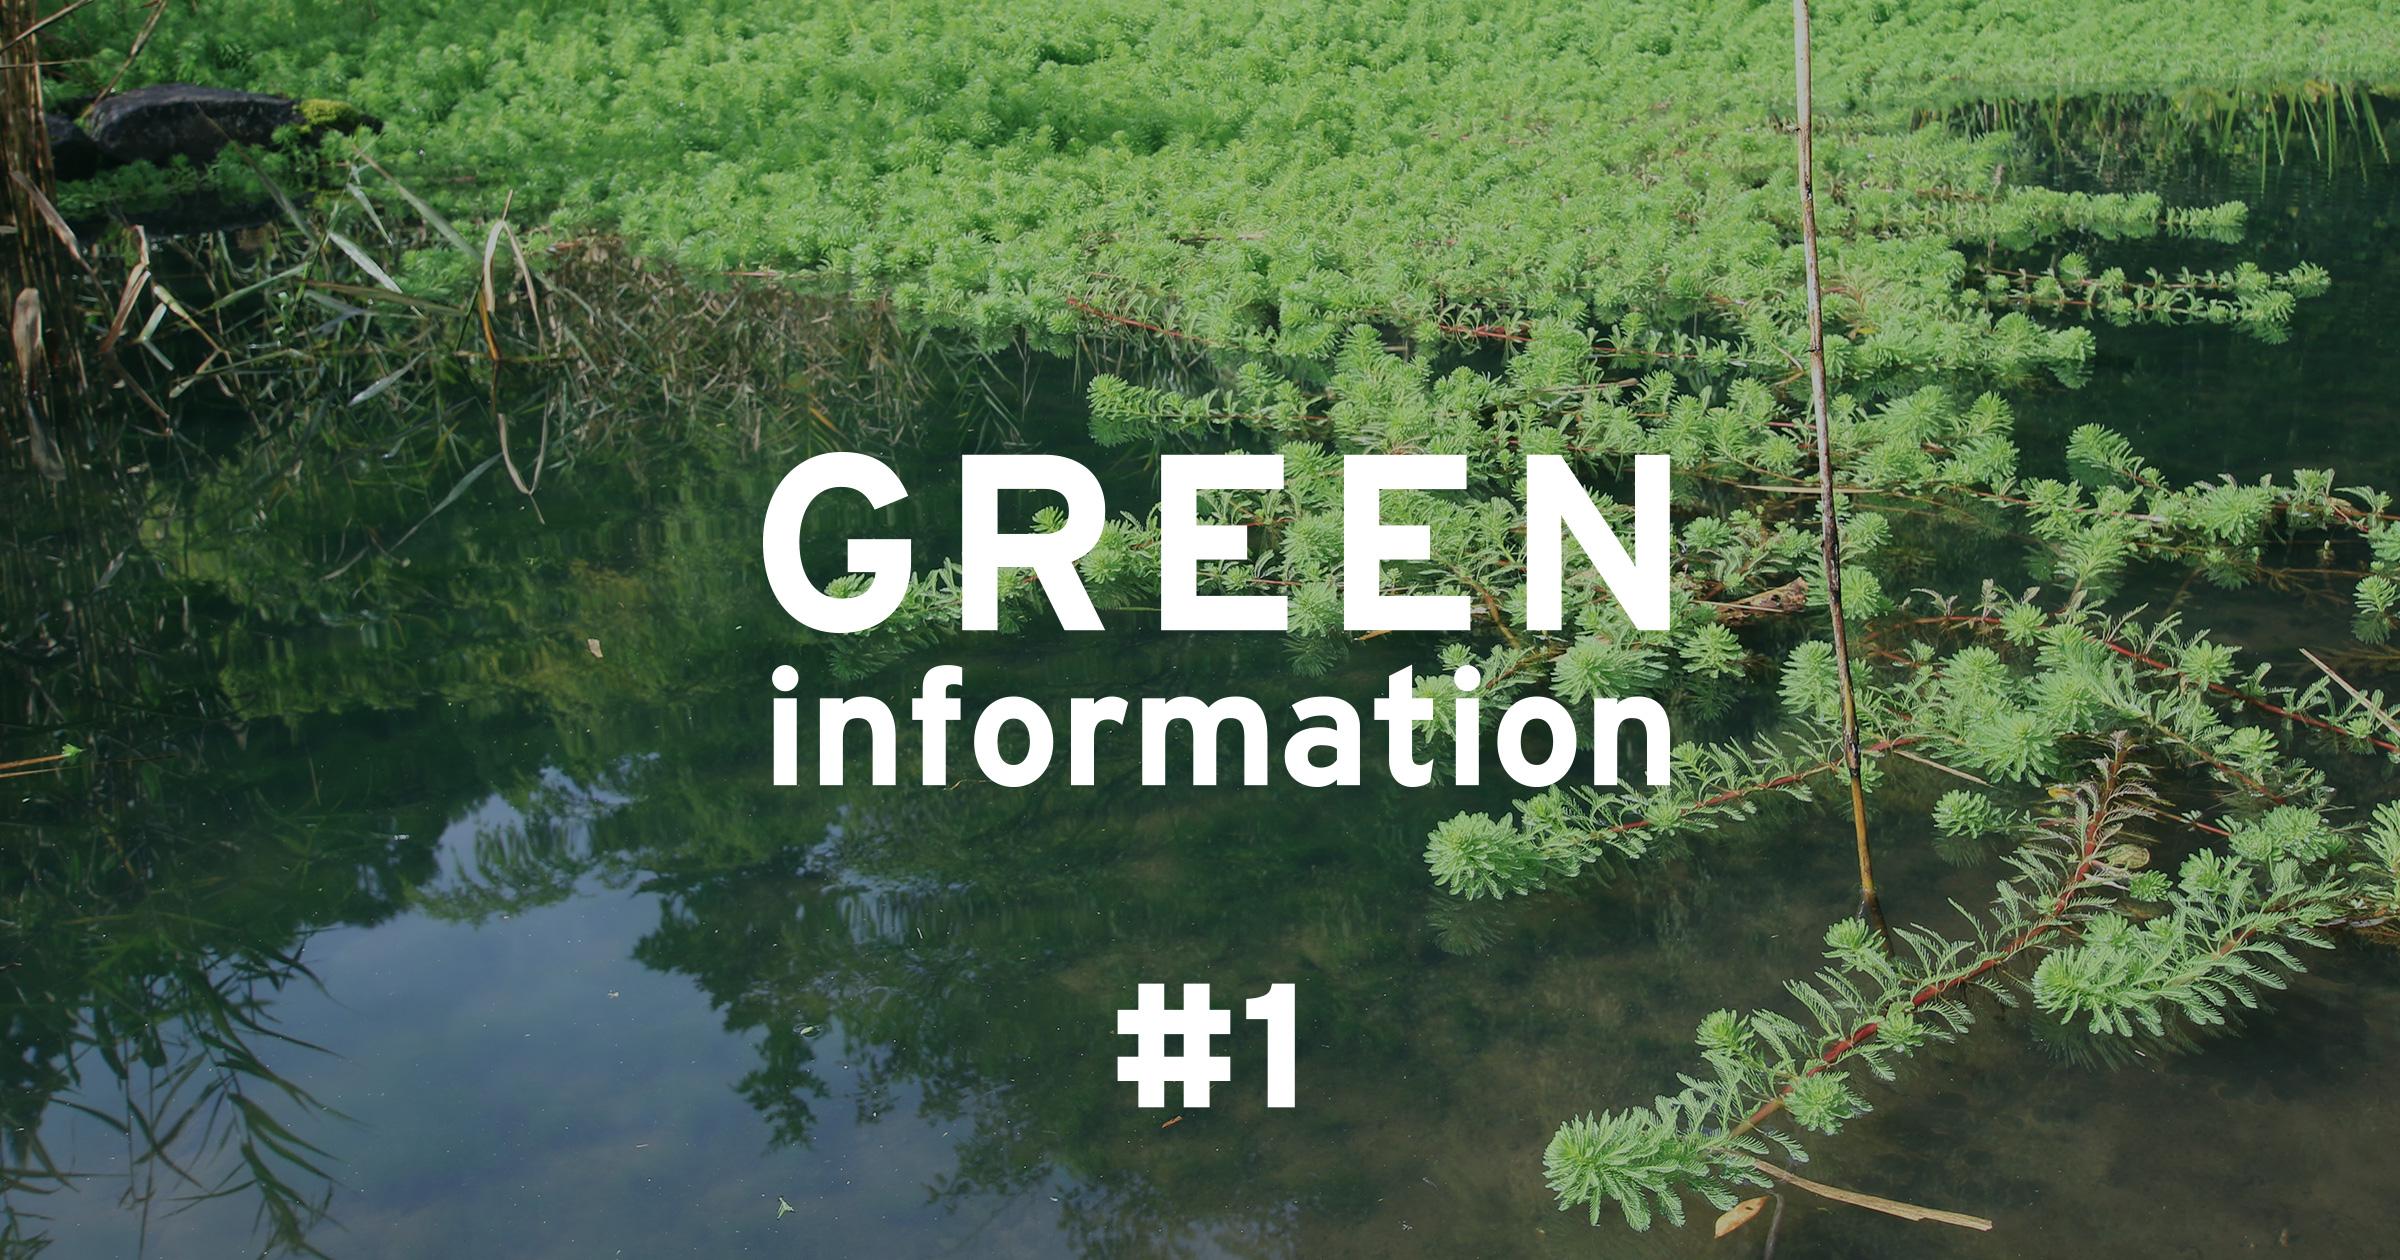 GREEN information #1 「熱帯の水草も越冬します」